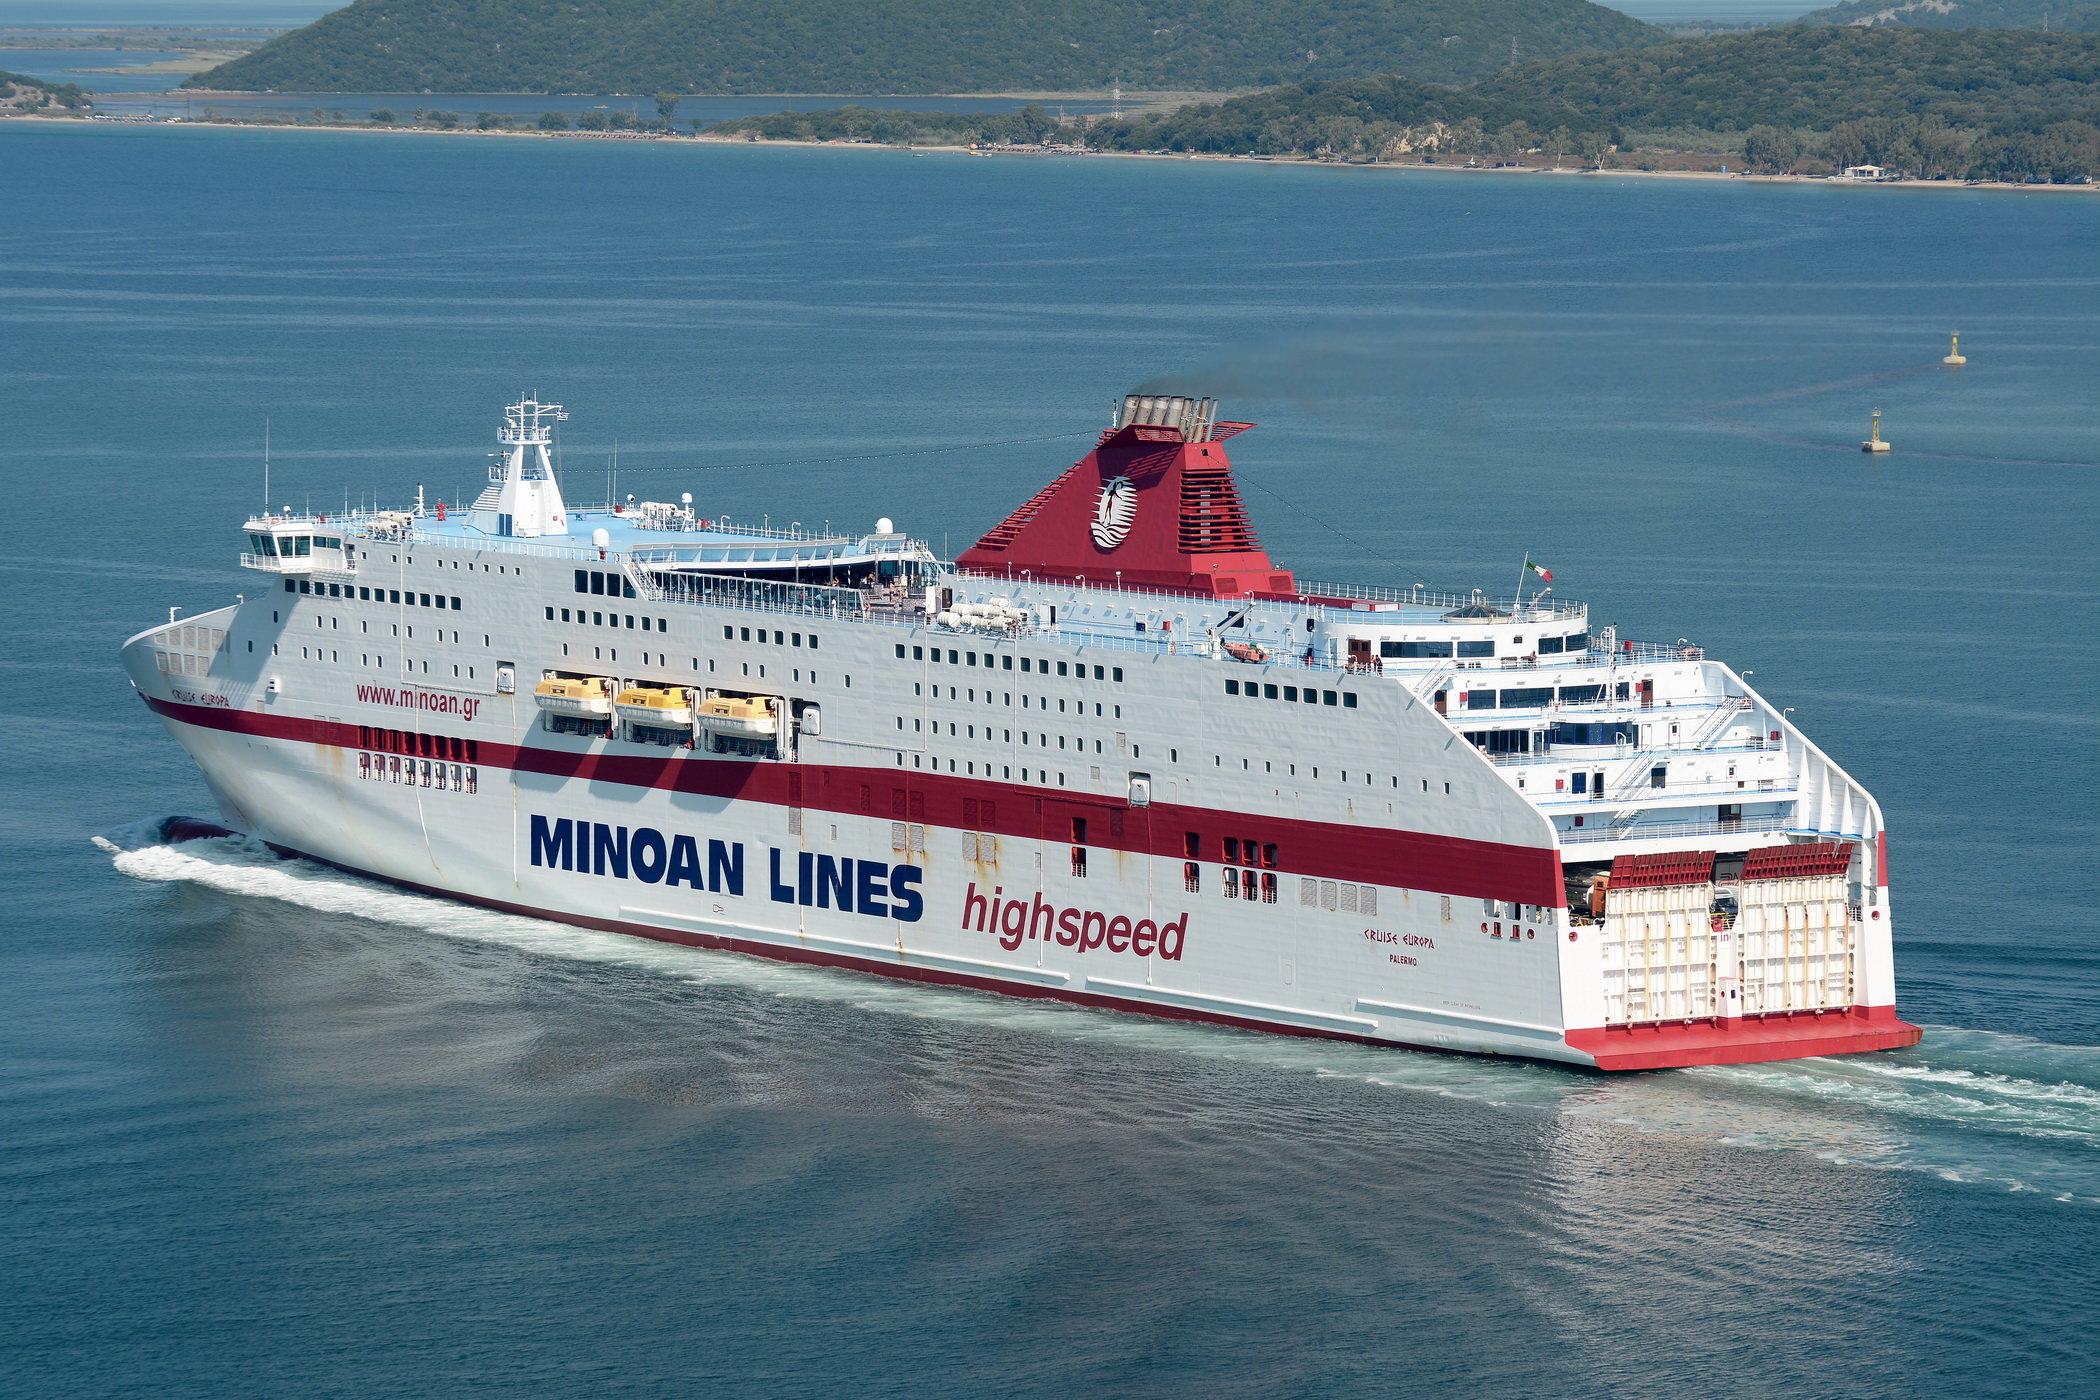 Cruise Europa_21-08-16_Igoumenitsa_25.jpg